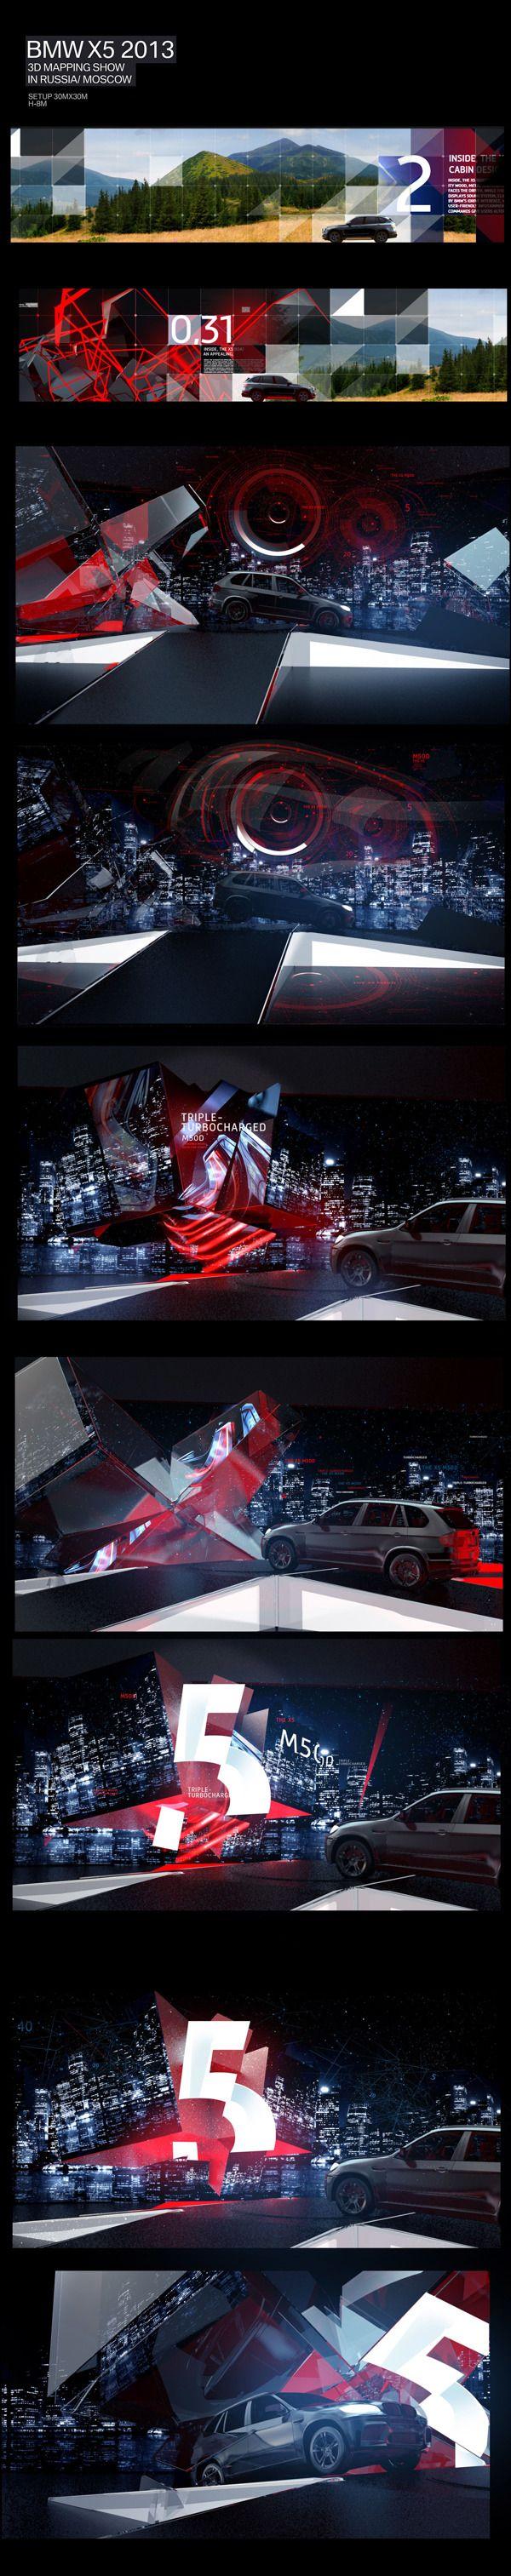 Cool Automotive Web Design on the Internet. BMW. #automotive #webdesign @ http://www.pinterest.com/alfredchong/automotive-web-design/